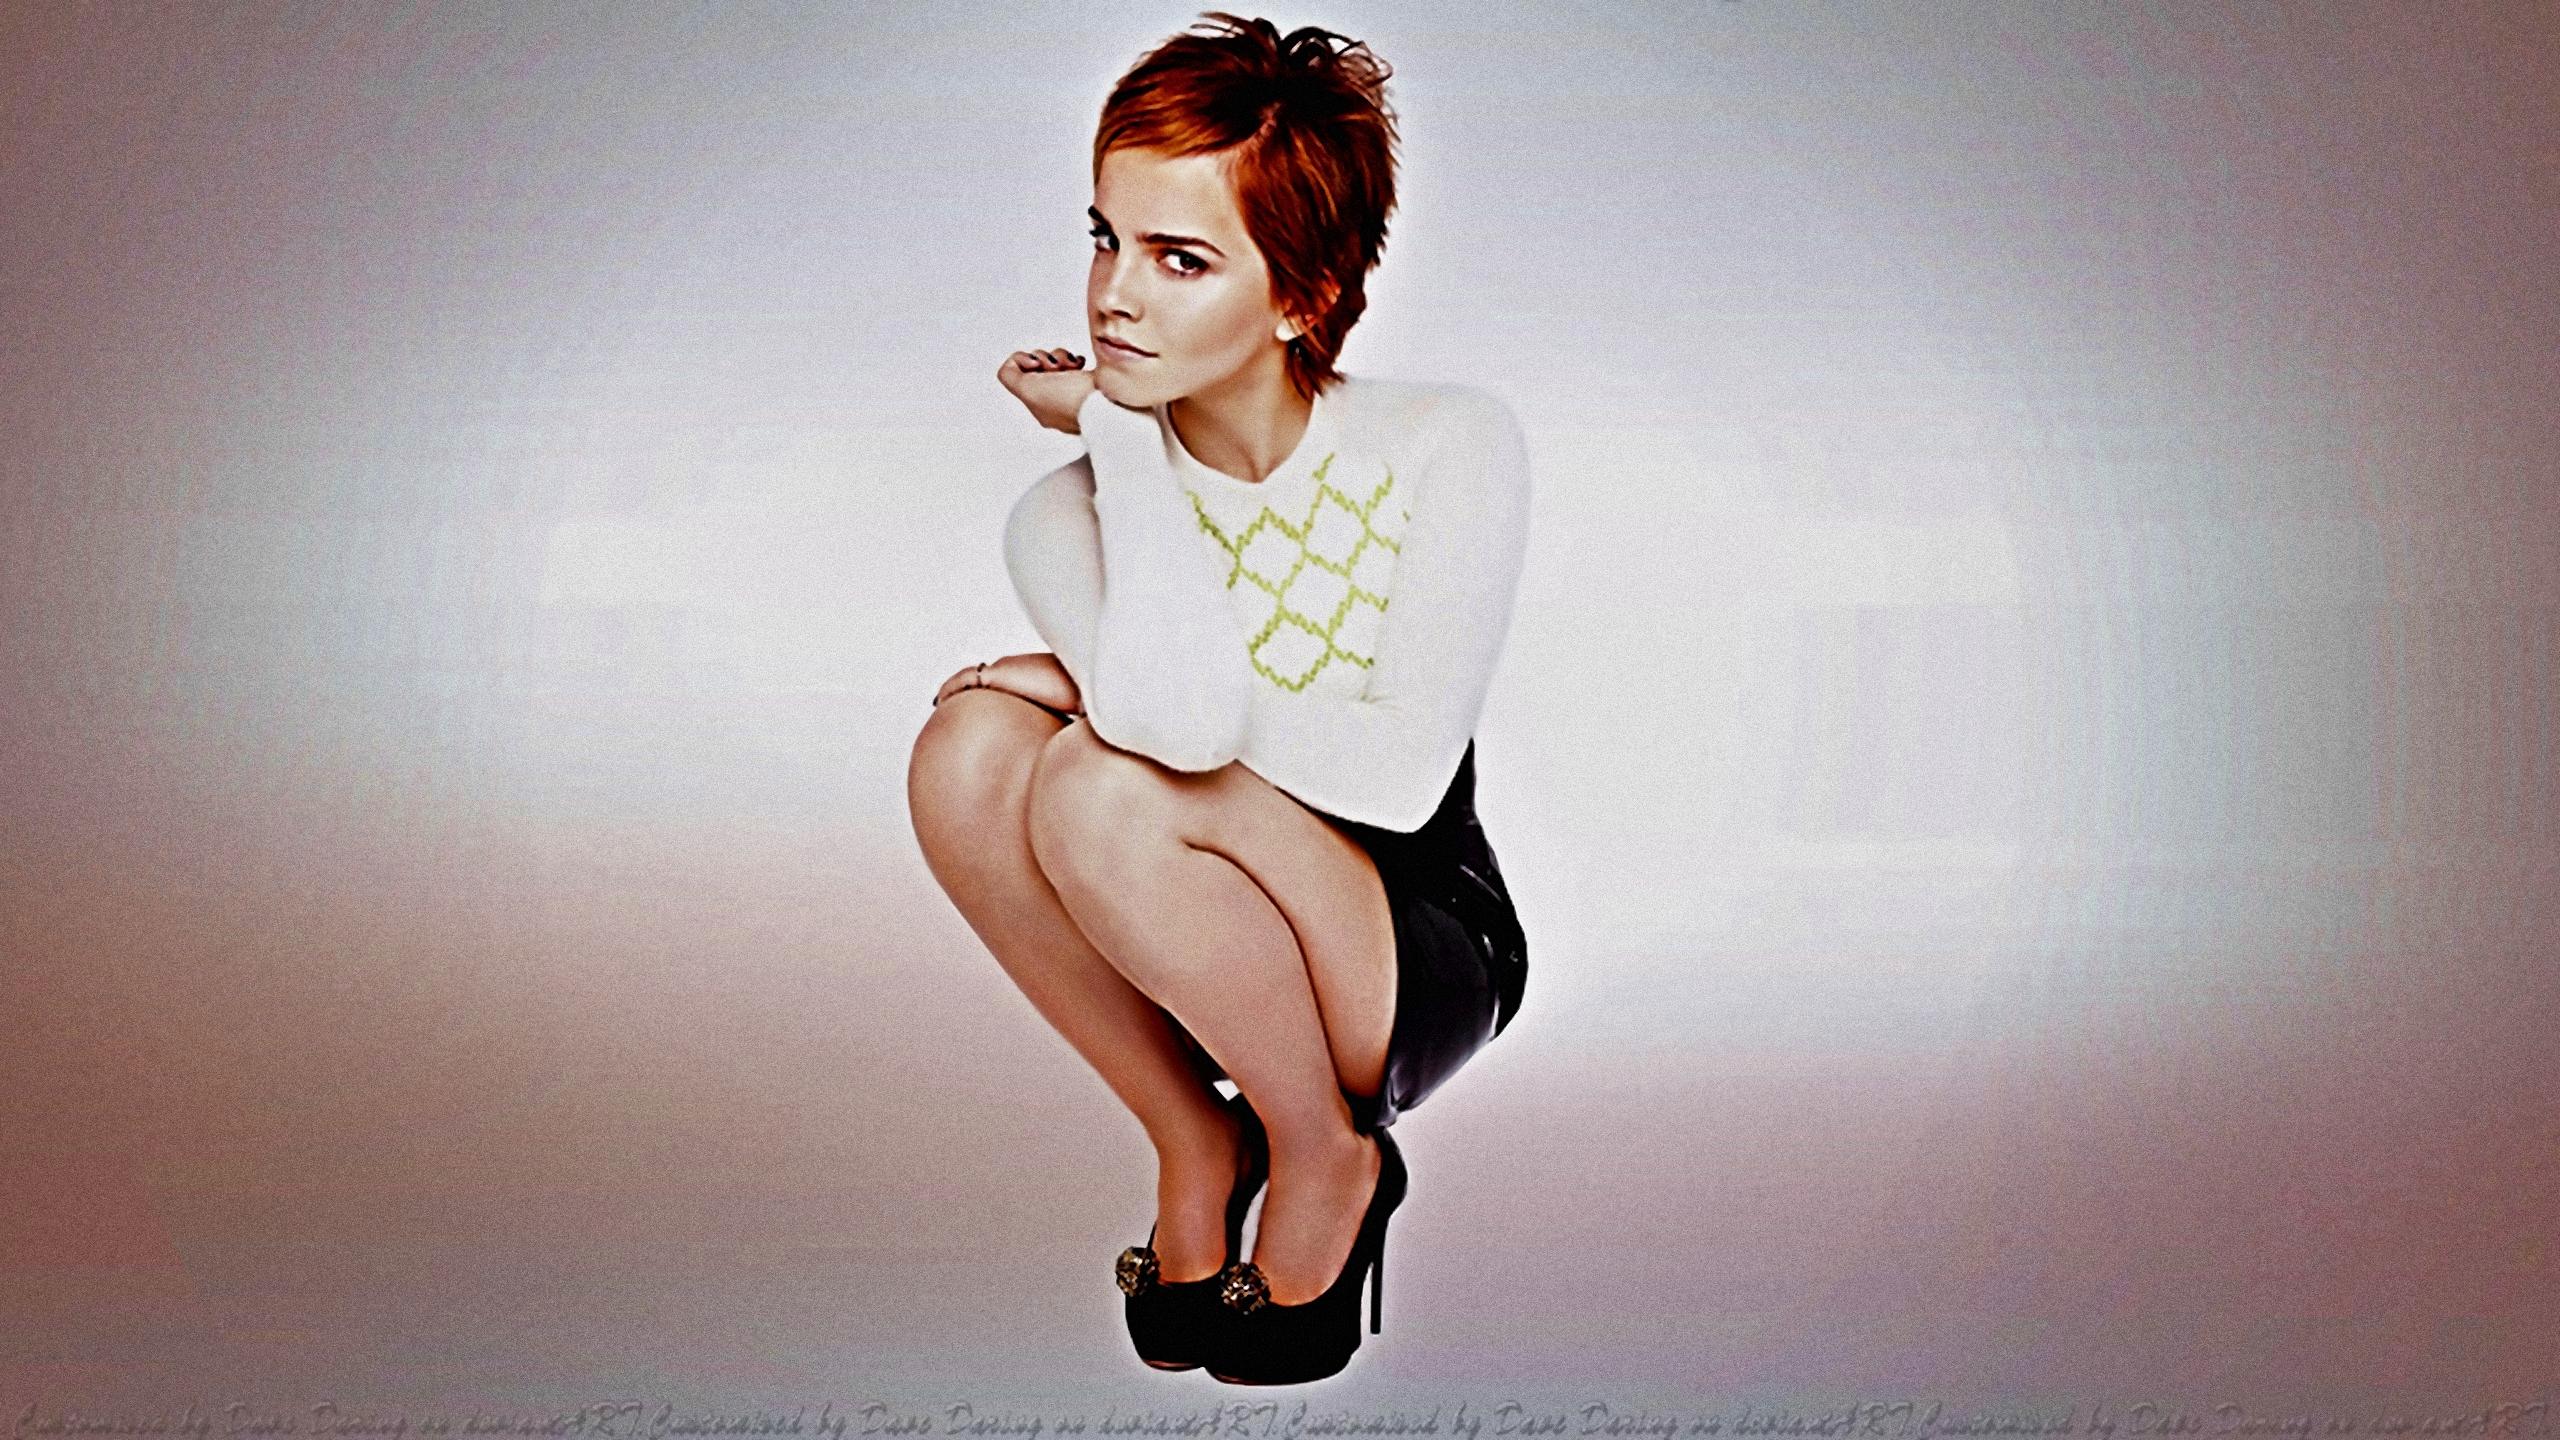 Emma Watson Kinky Skirt by Dave-Daring